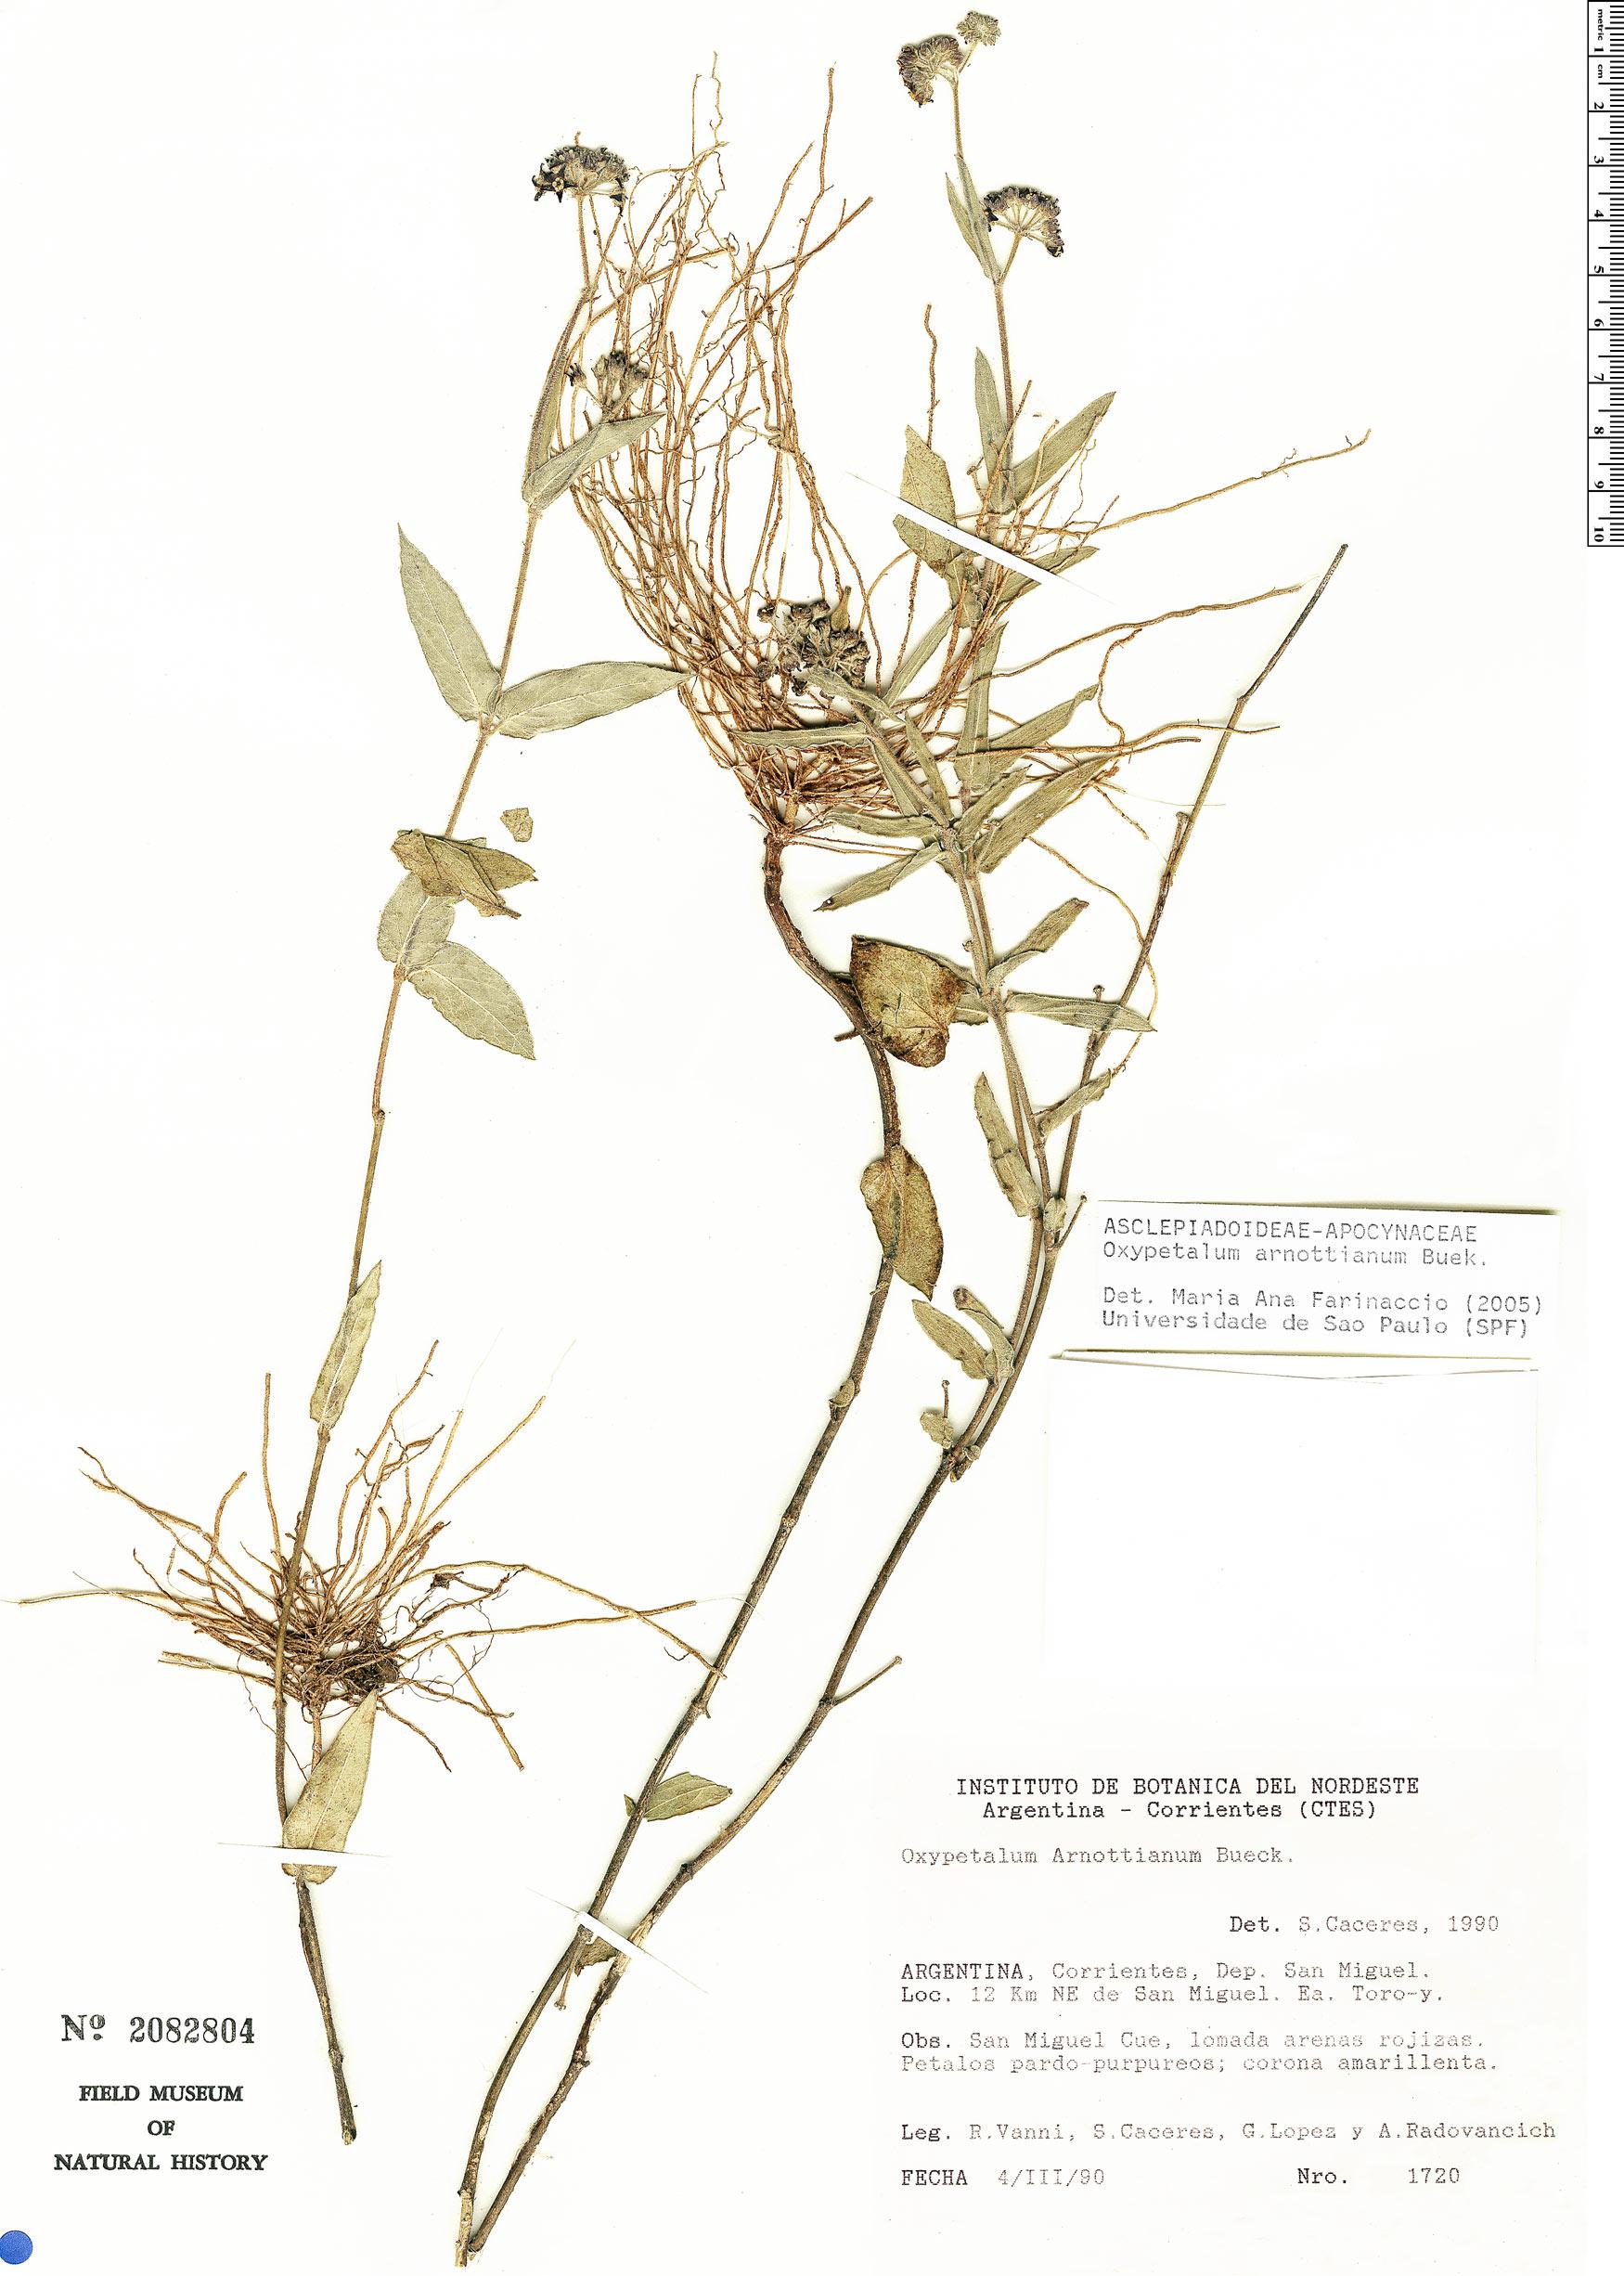 Specimen: Oxypetalum arnottianum